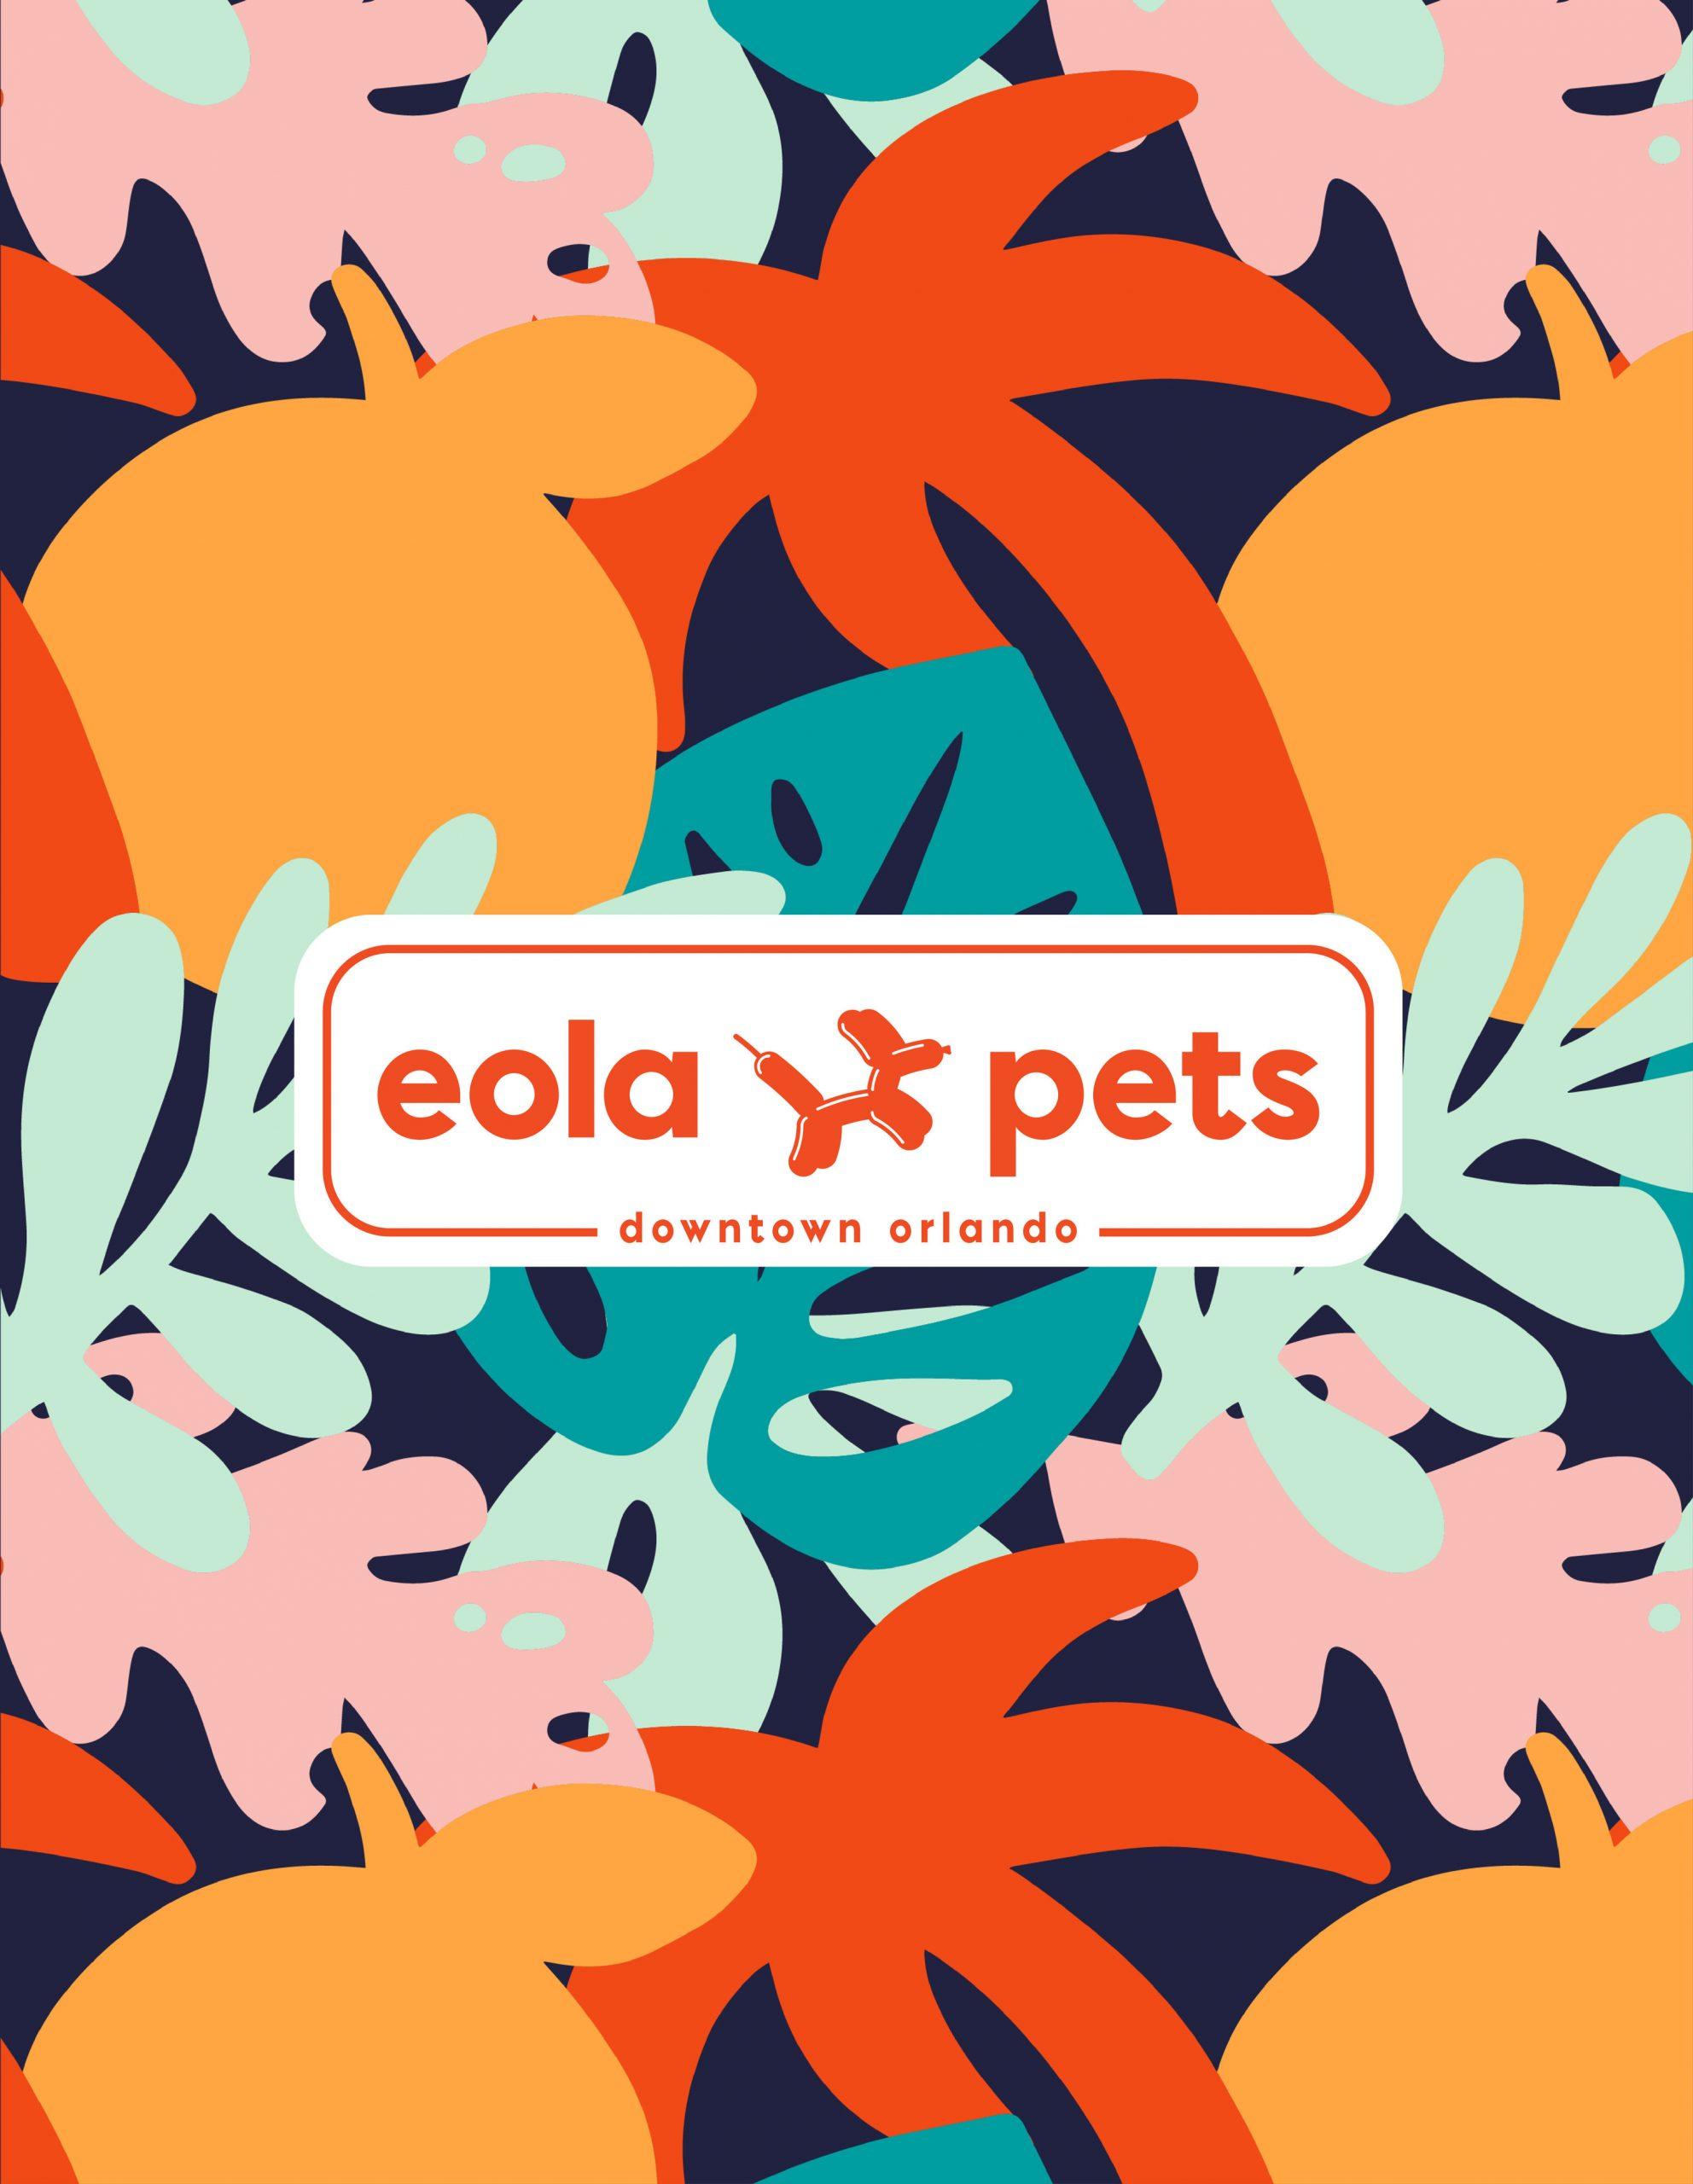 Eola Pets Downtown Orlando logo